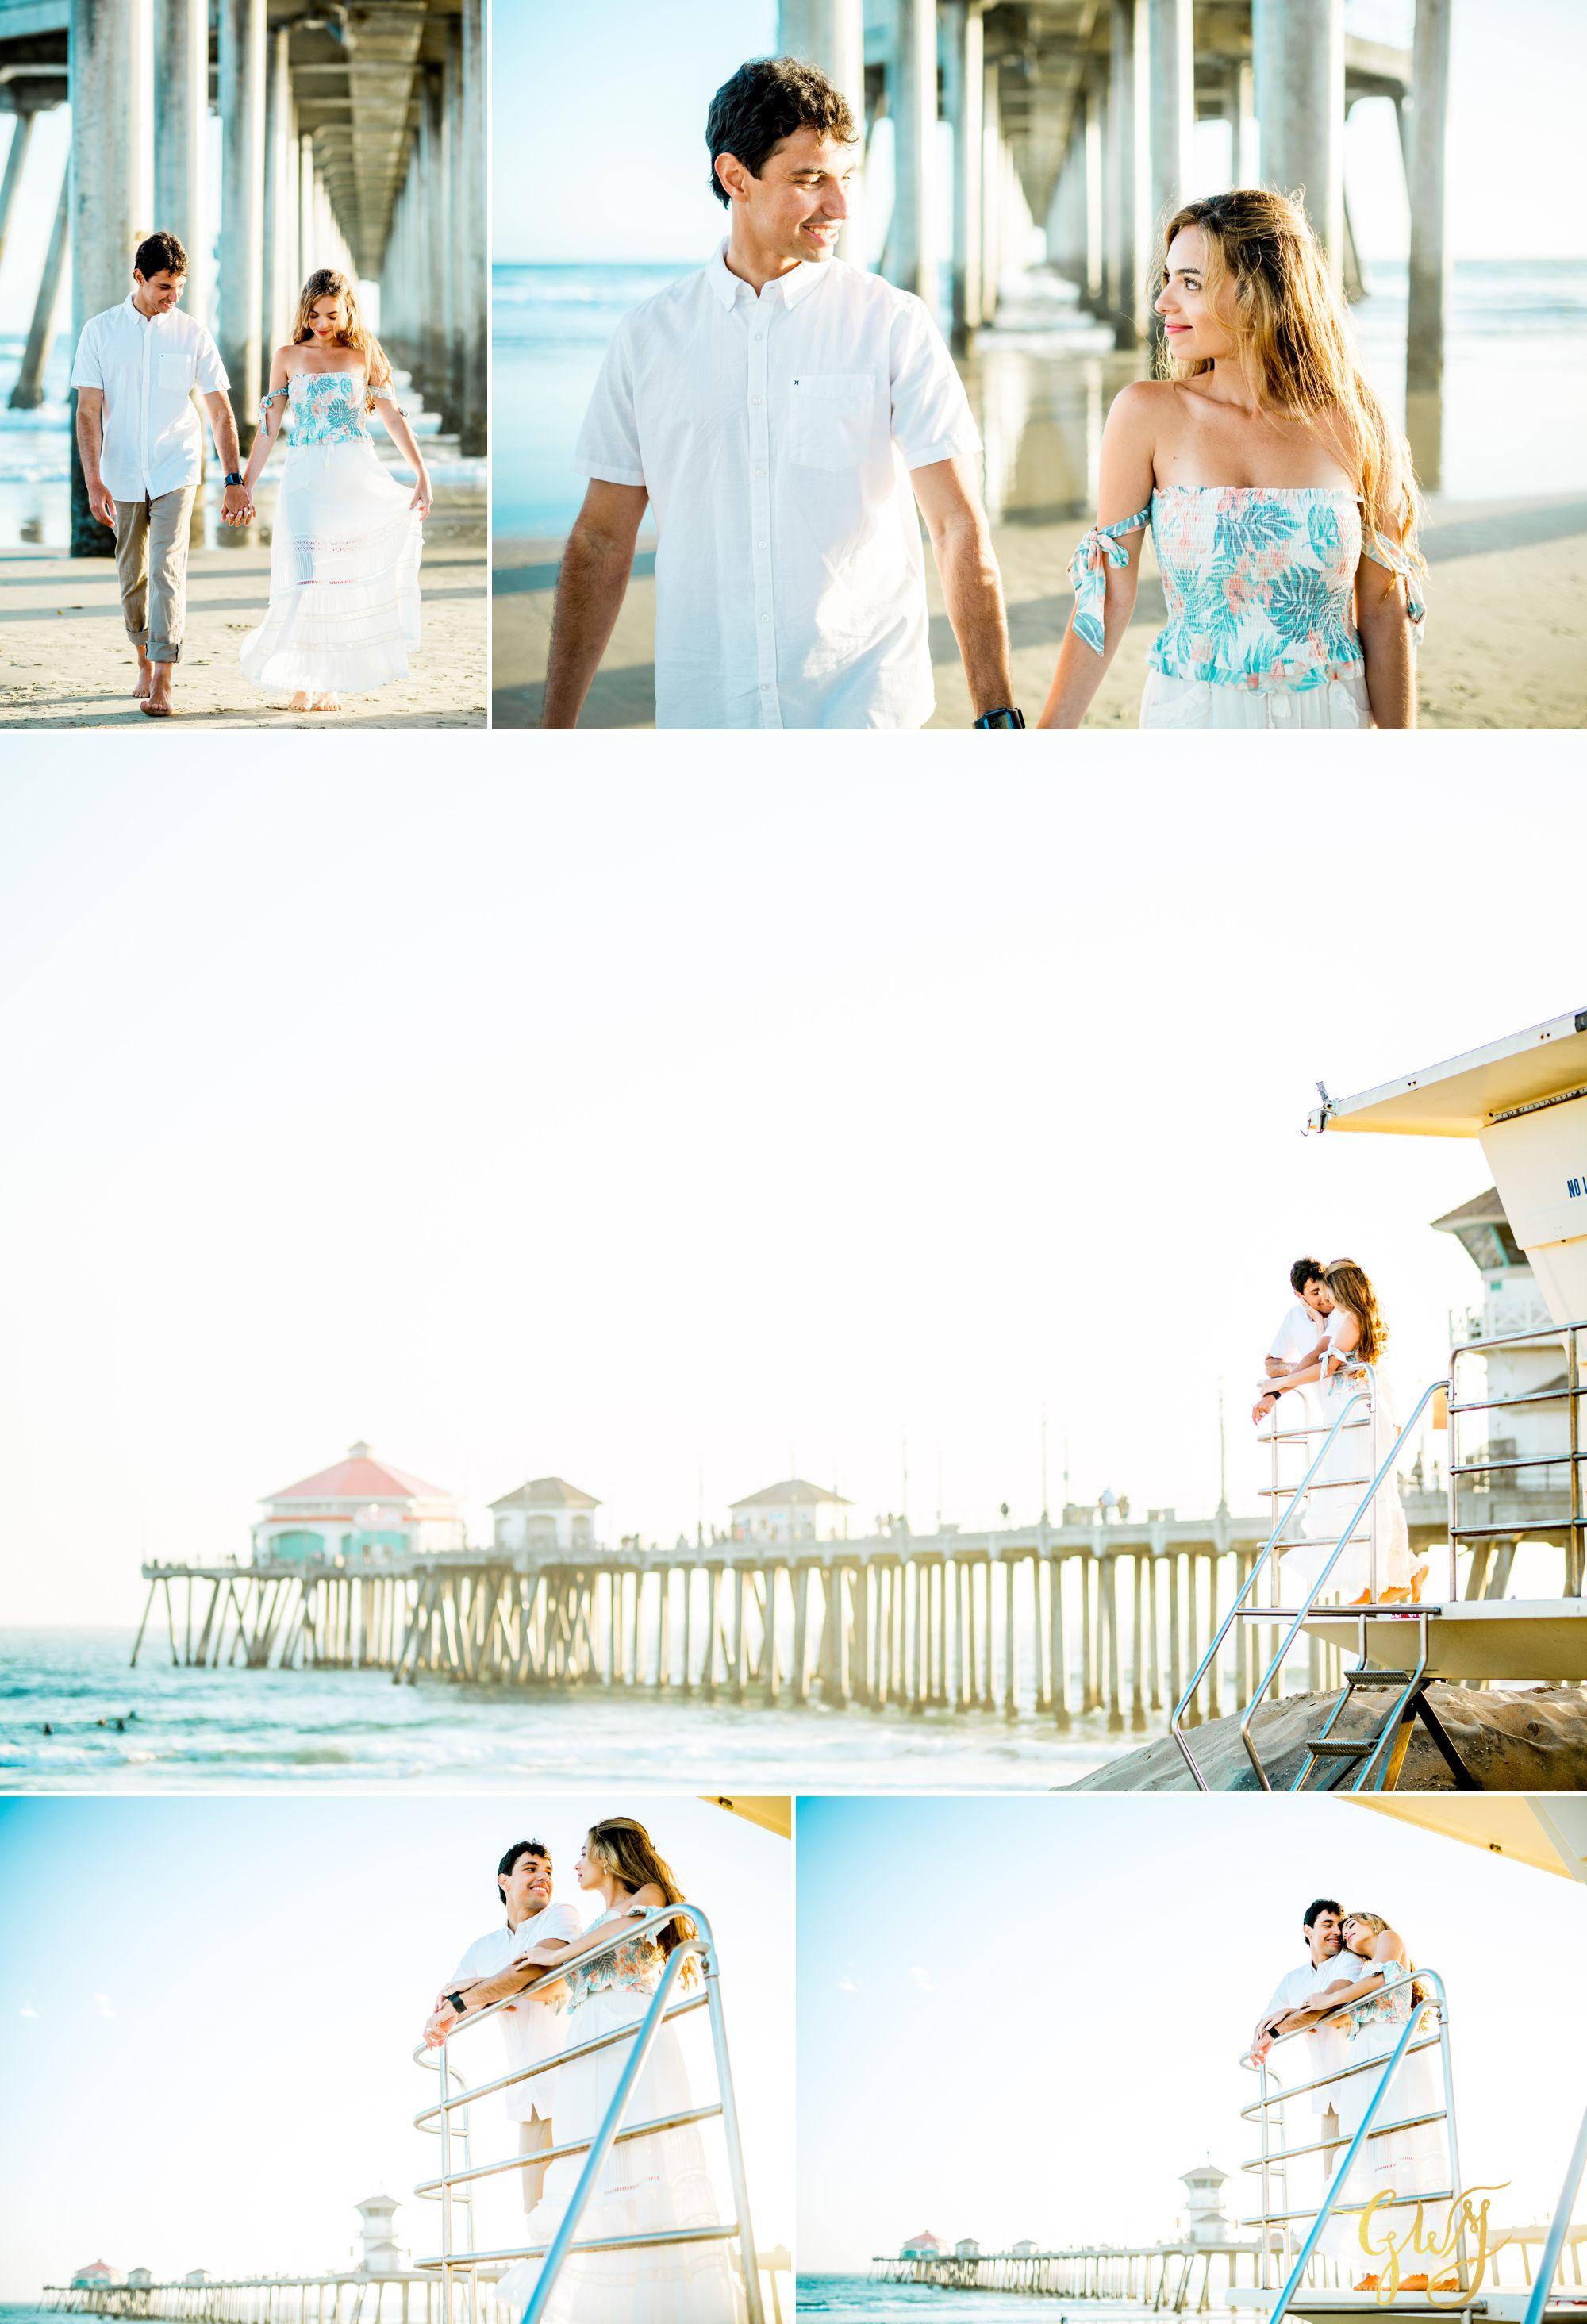 Felipe + Isabella Huntington Beach Summer Sunset Engagement Session by Glass Woods Media 18.jpg